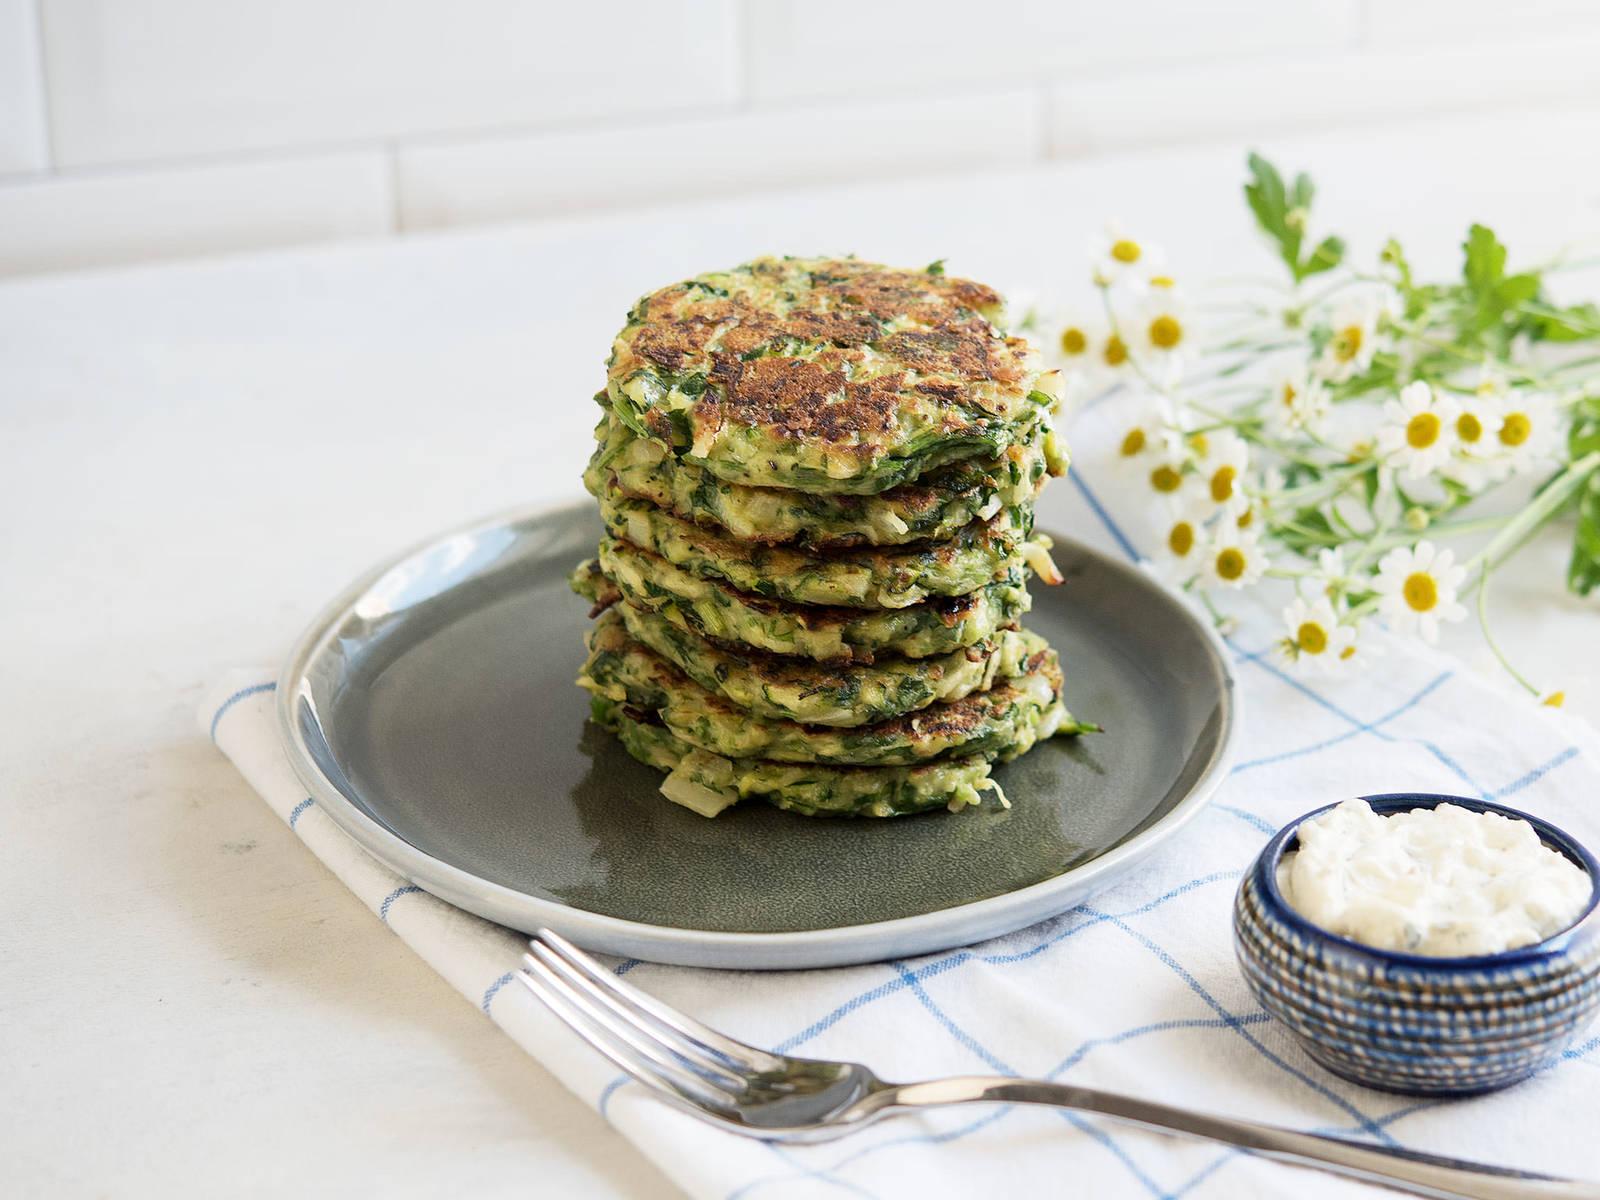 Zucchini-Parmesan pancakes with dip